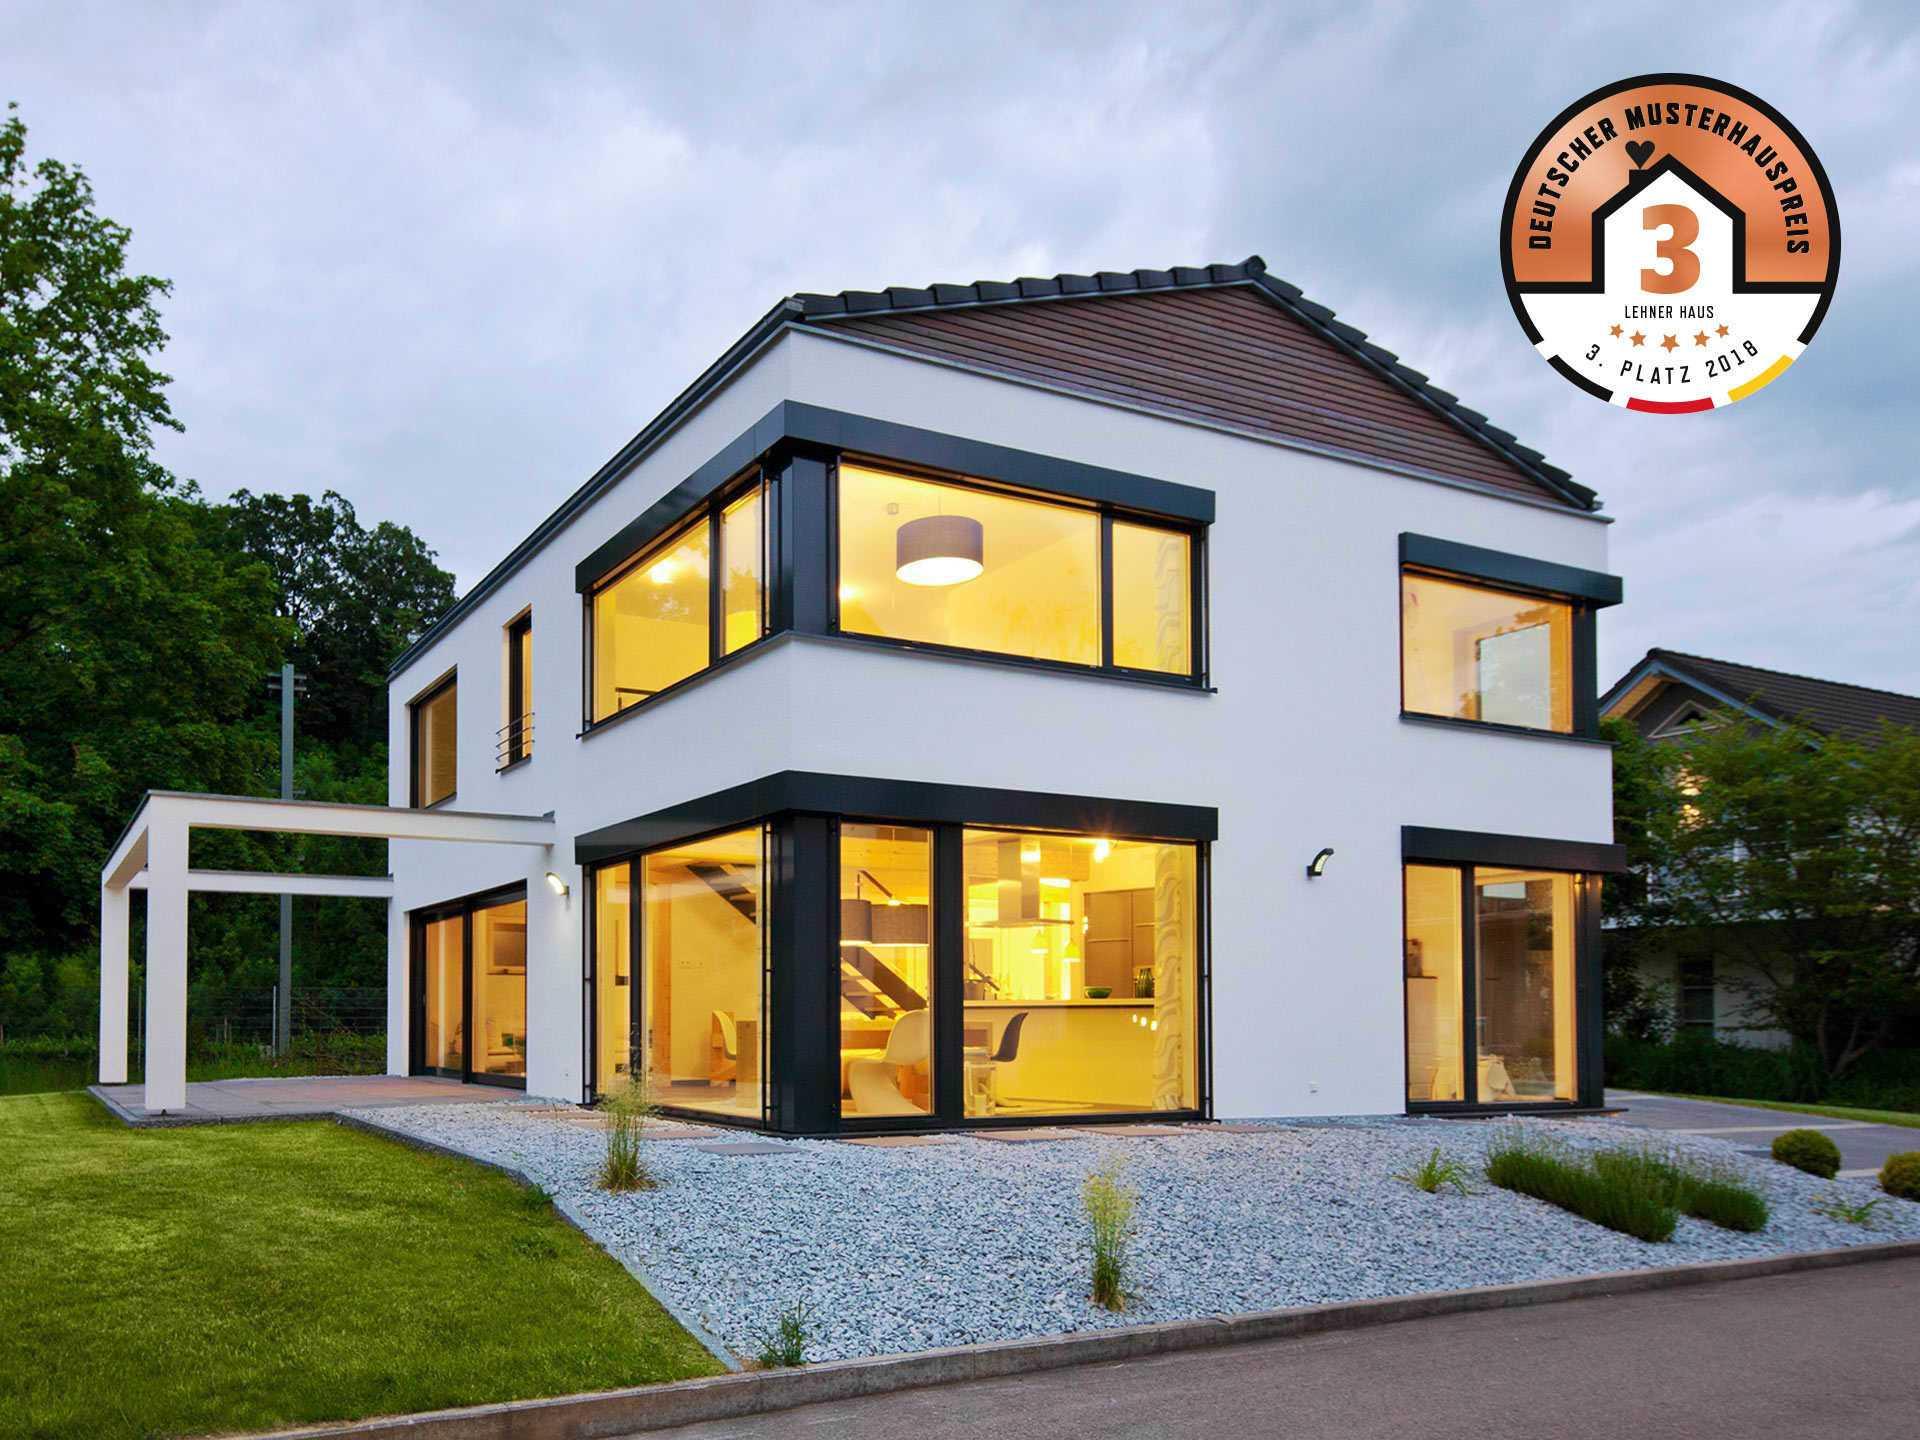 Lehner Musterhaus Ulm - Lehner Haus | Musterhaus.net